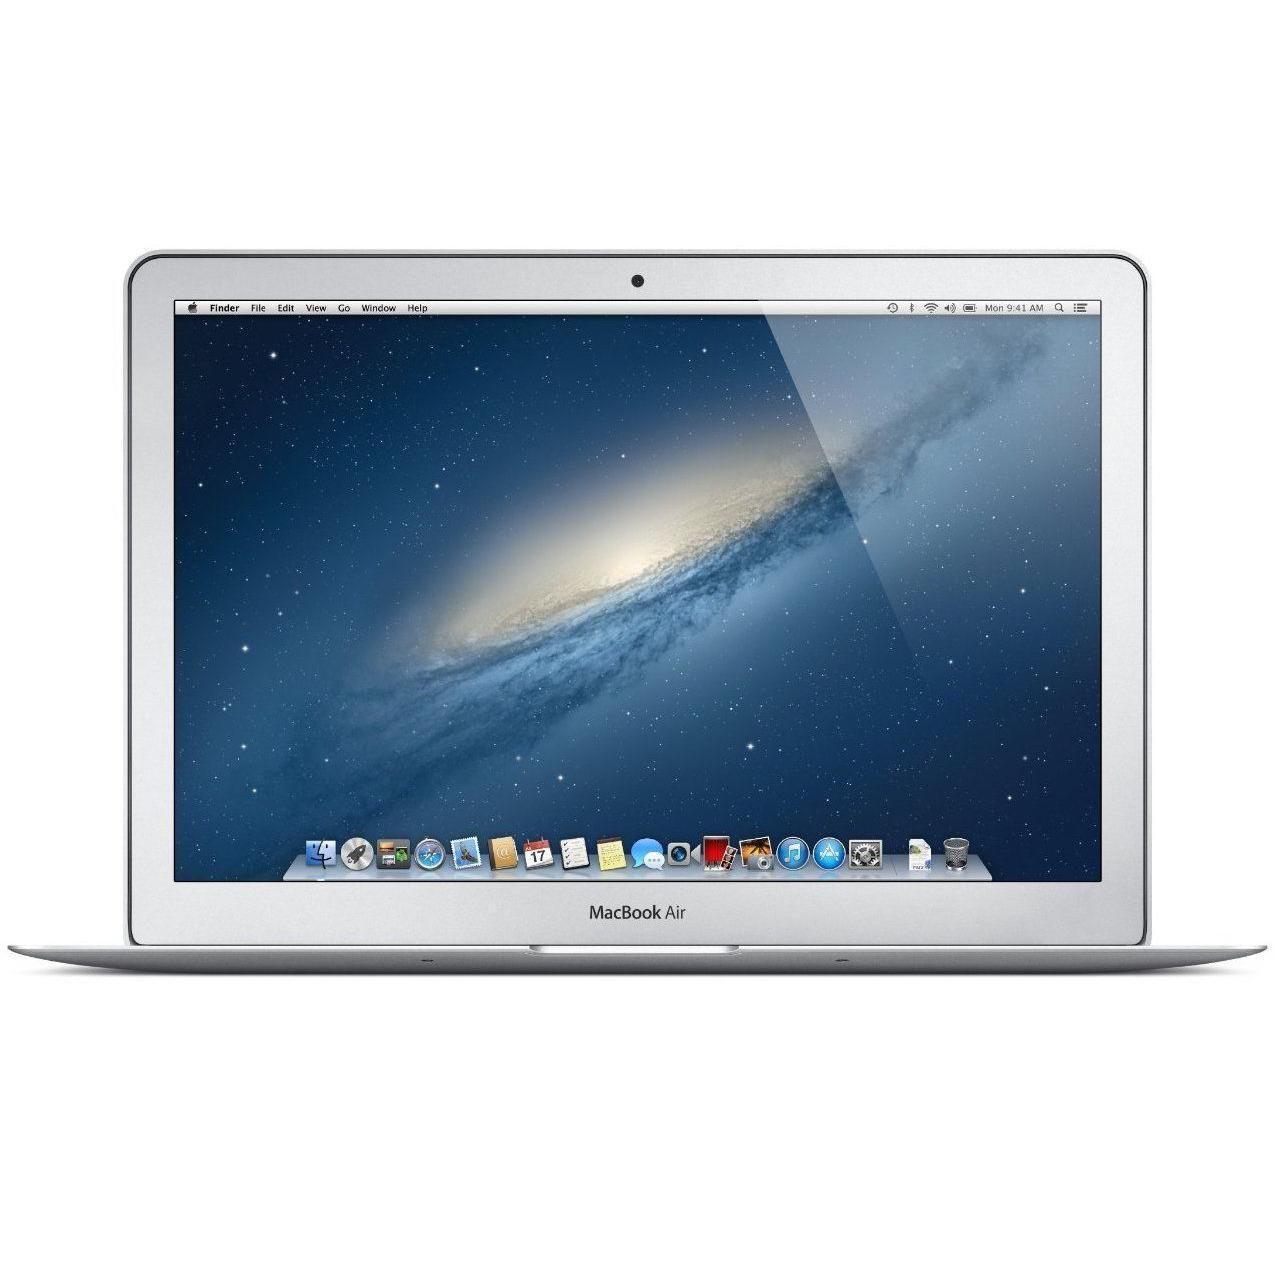 Macbook Air 13 3 Inch Mid 2013 Core I5 4gb Ssd 256 Gb In 2020 Apple Macbook Macbook Air Apple Macbook Air